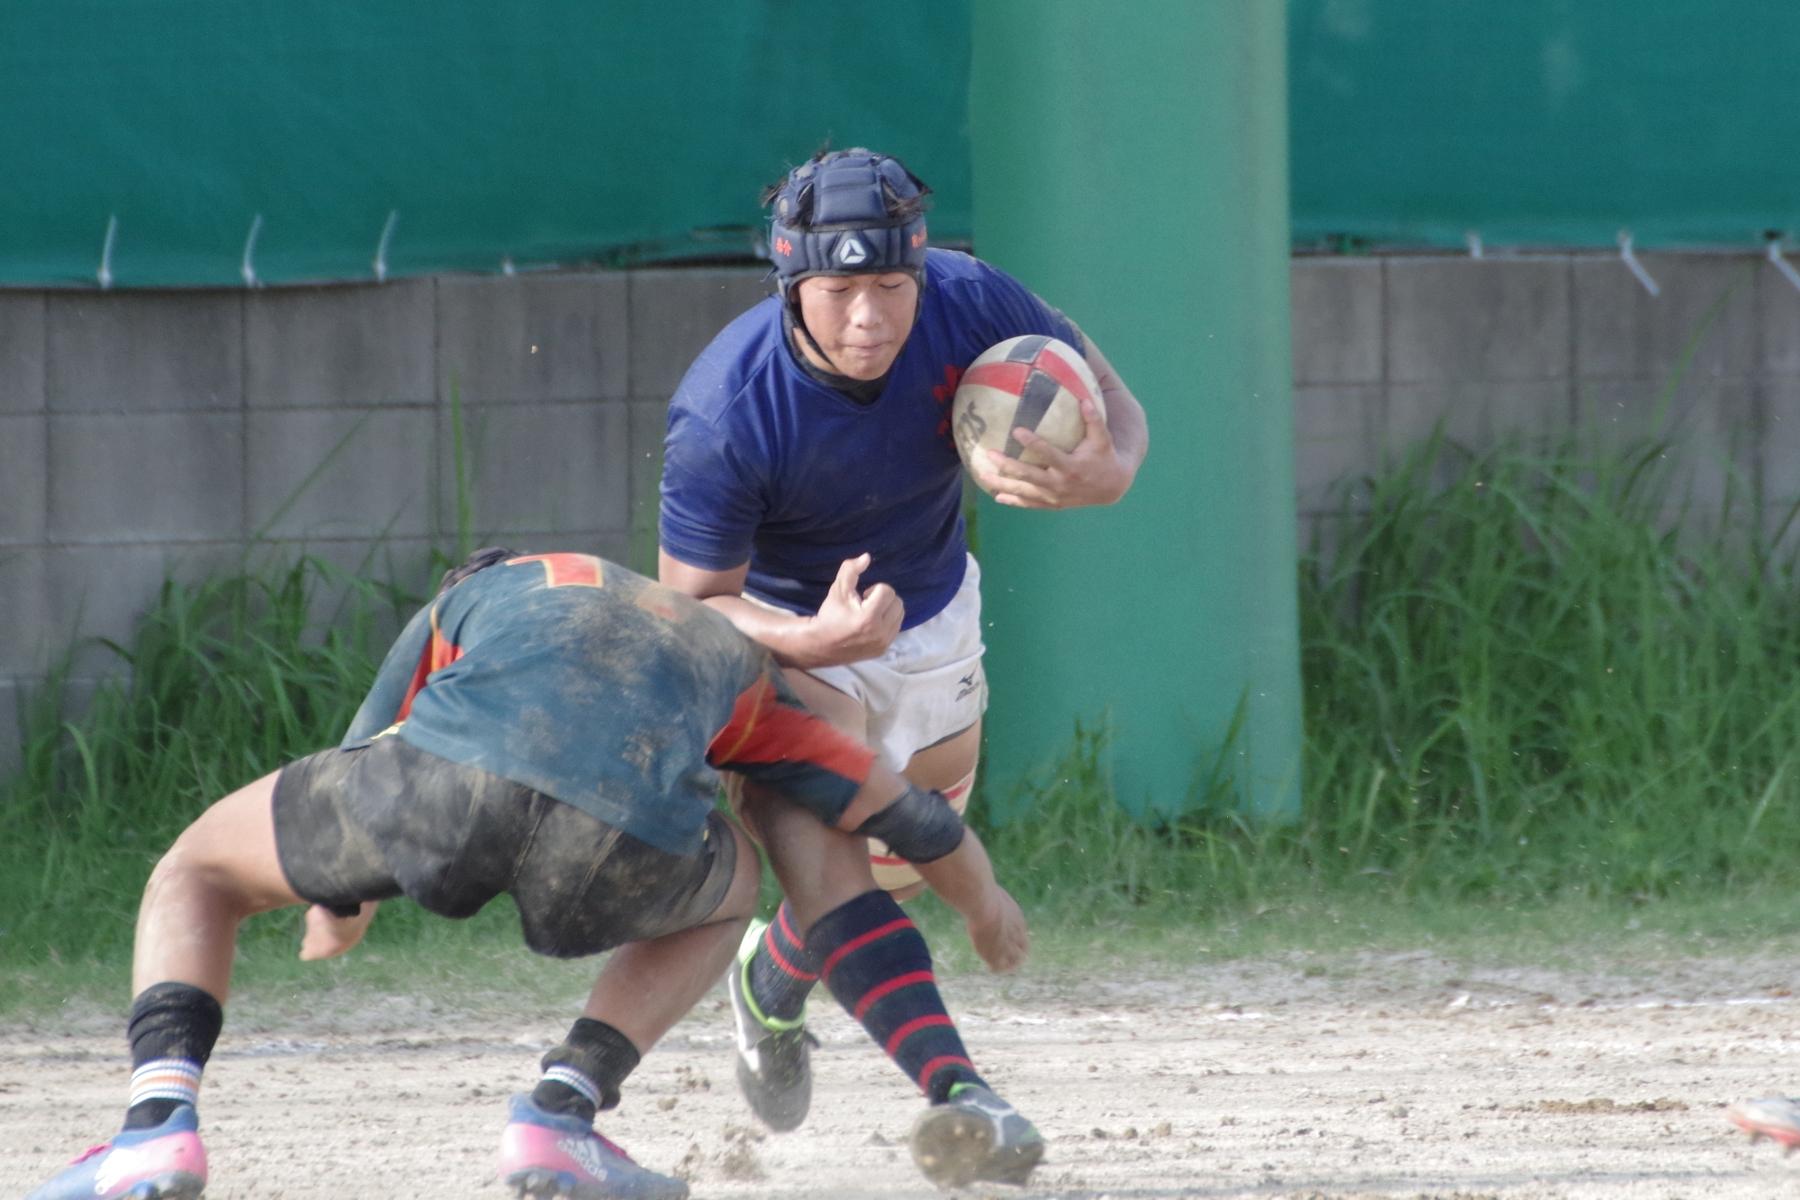 http://kokura-rugby.sakura.ne.jp/181007_152416_1271.jpg